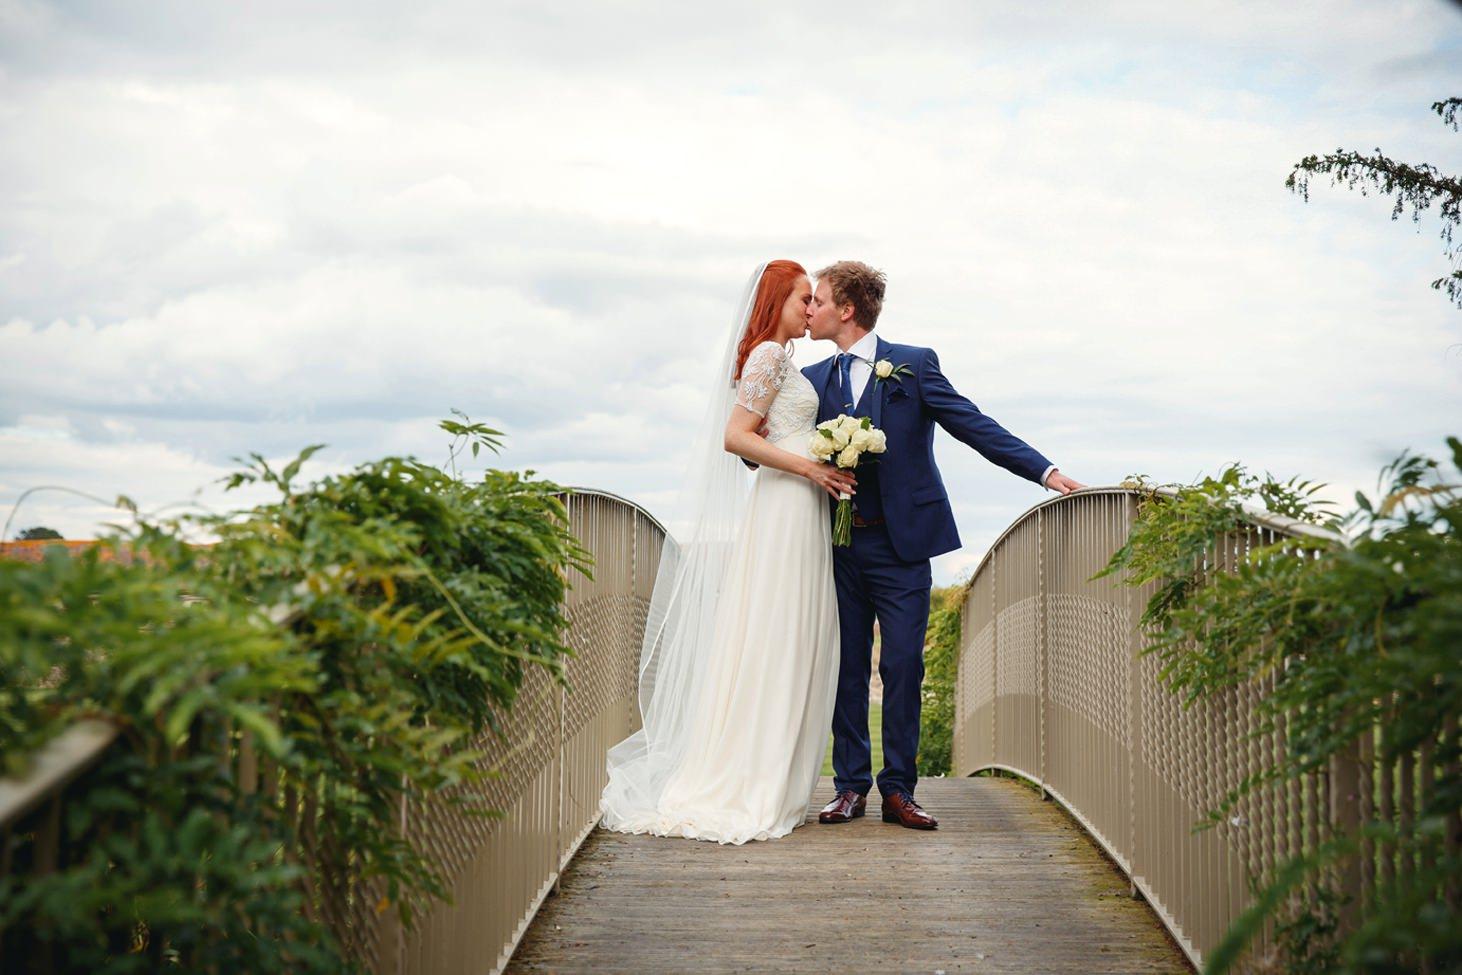 caswell house wedding photography bride and groom kissing on bridge